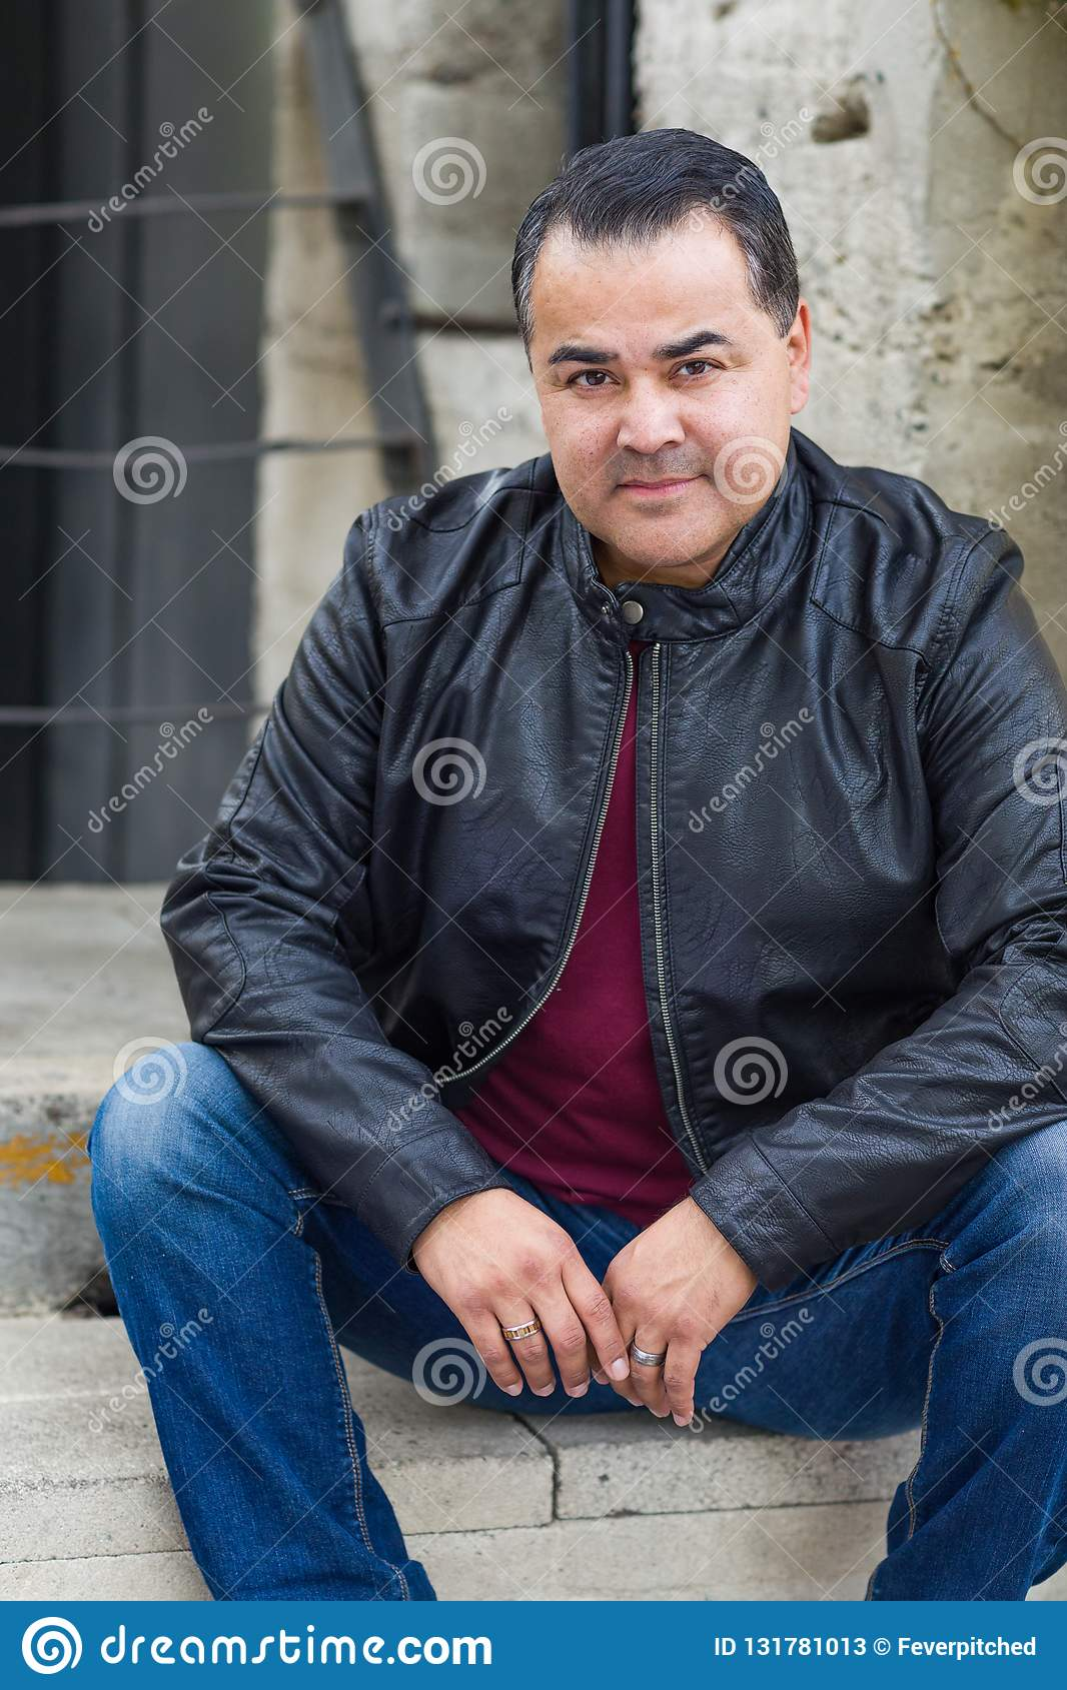 Portrait of Handsome Hispanic Man Wearing a Black Leather Jacket